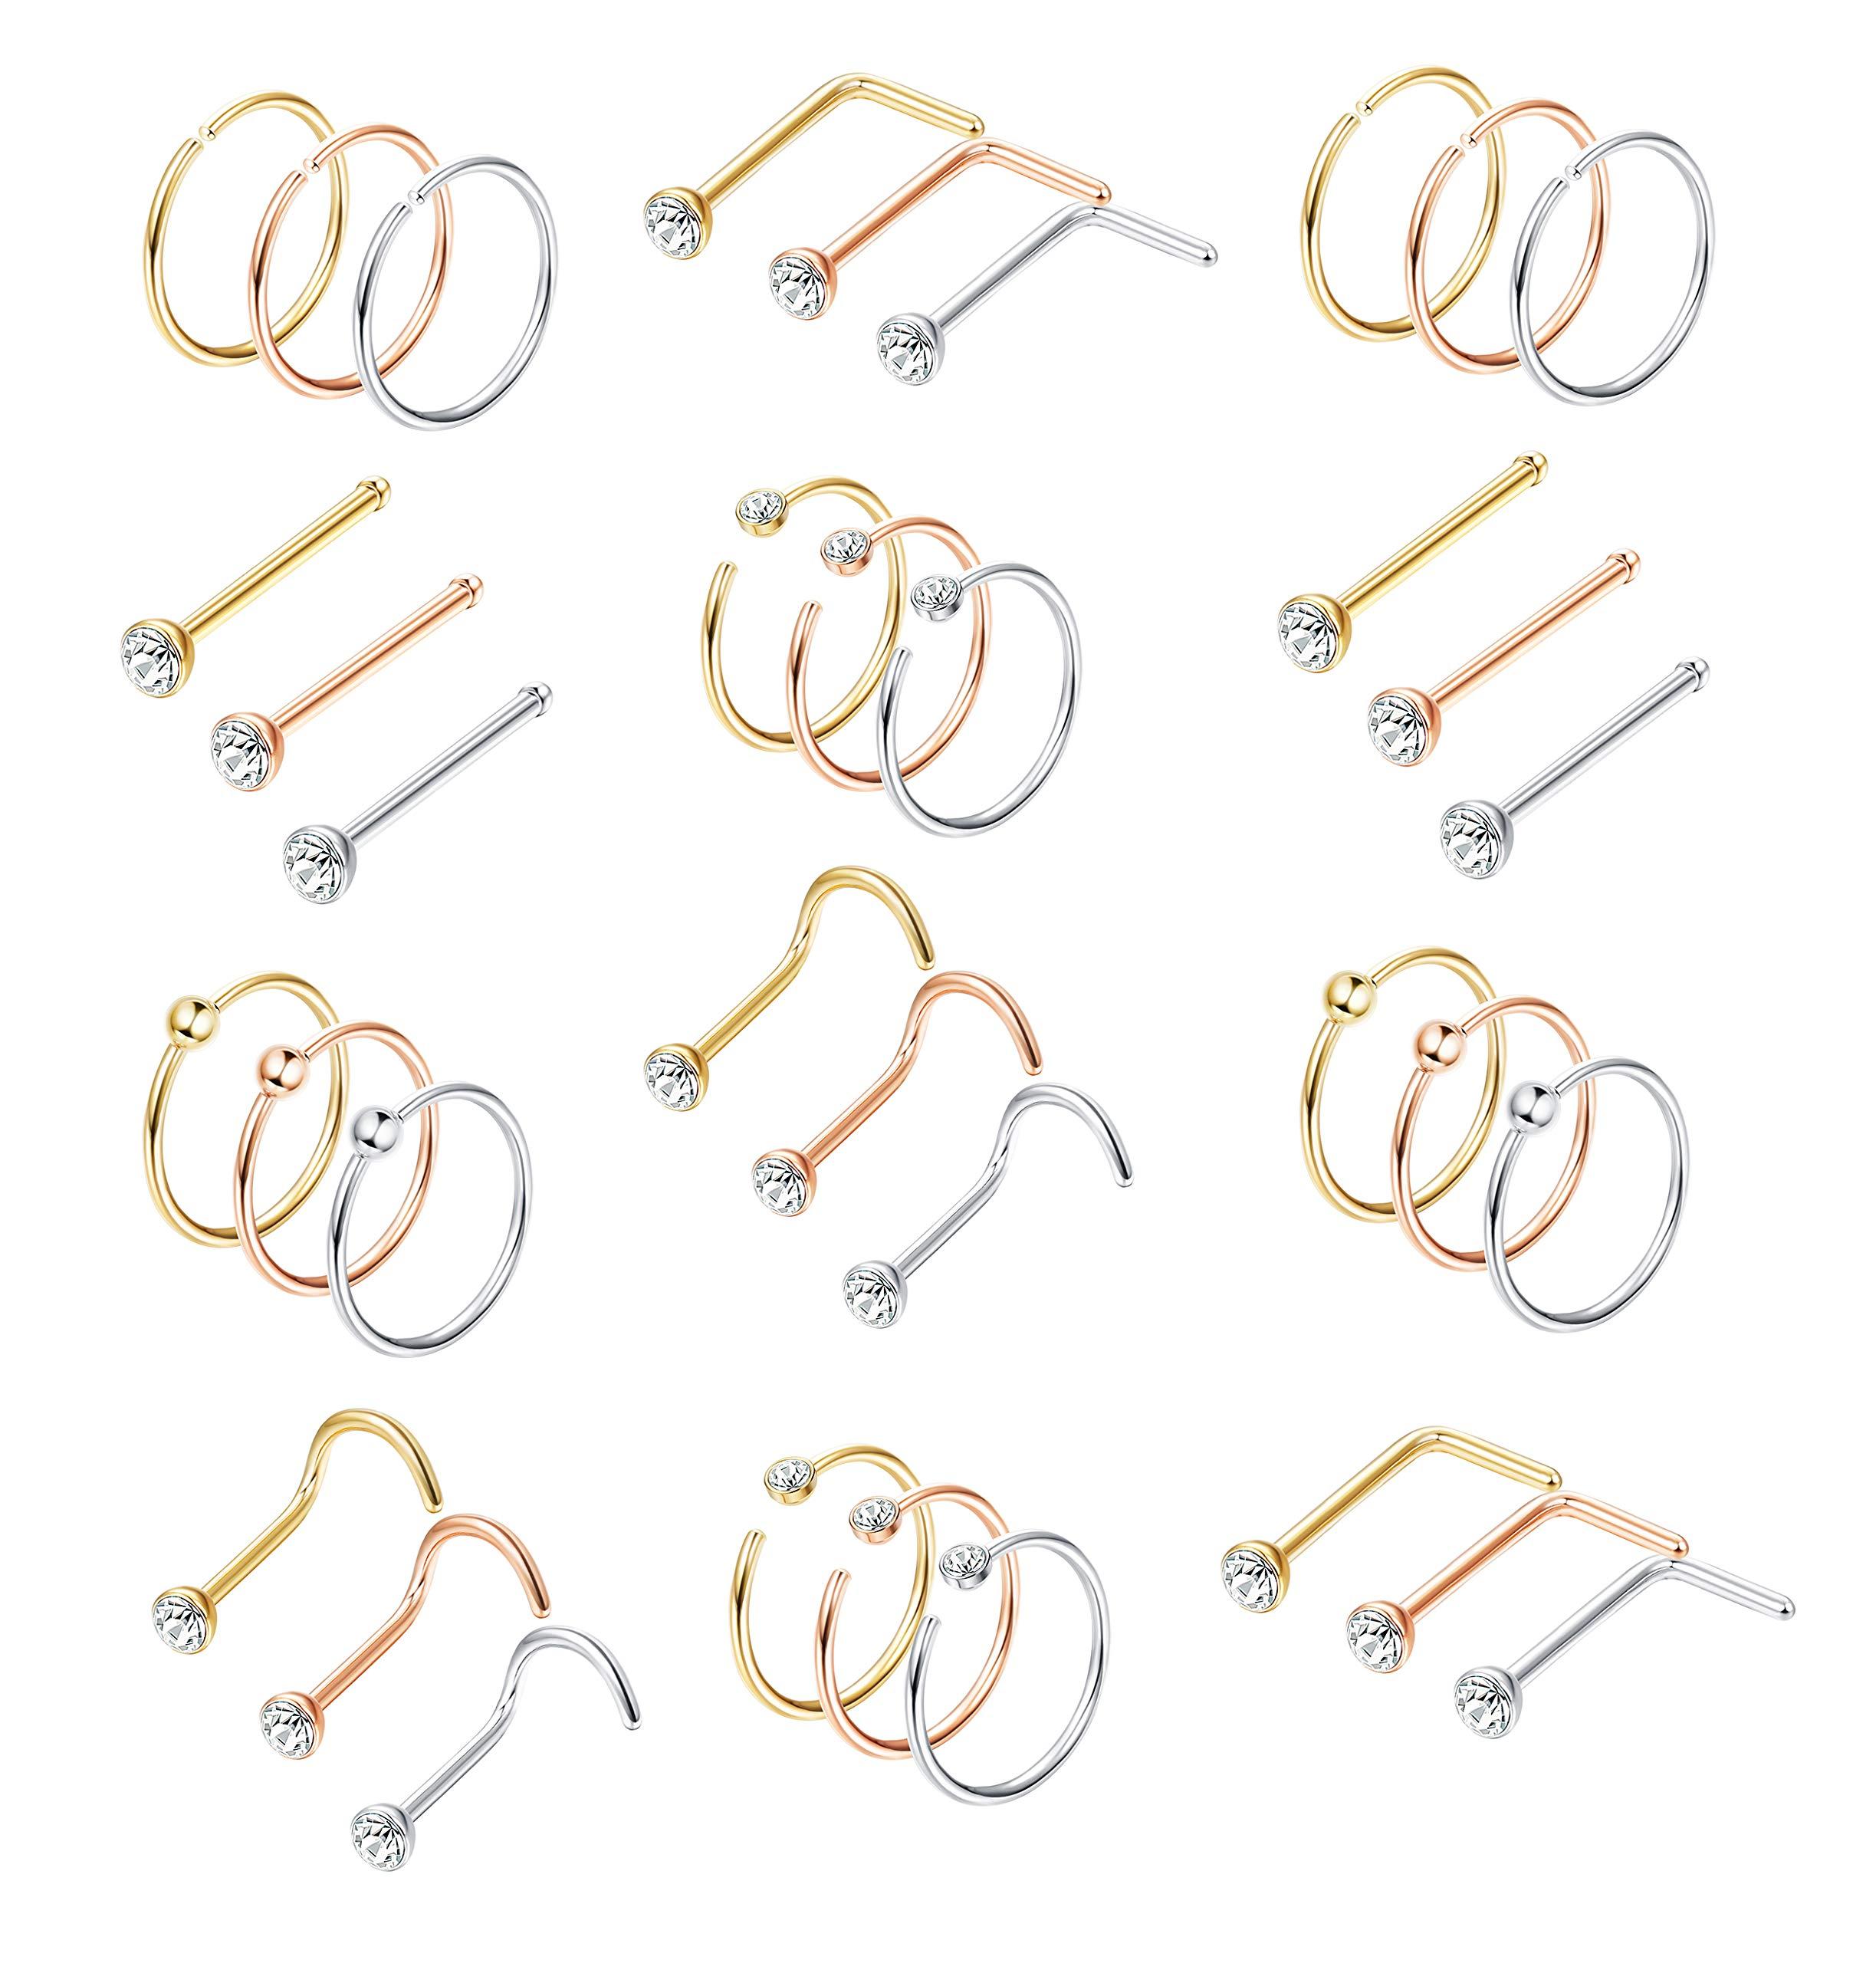 Milacolato 36pcs 316L Stainless Steel Nose Ring Hoop Nose Stud Piercing for Women Girls Hoop Cartilage Tragus Ear Piercing Set Silver